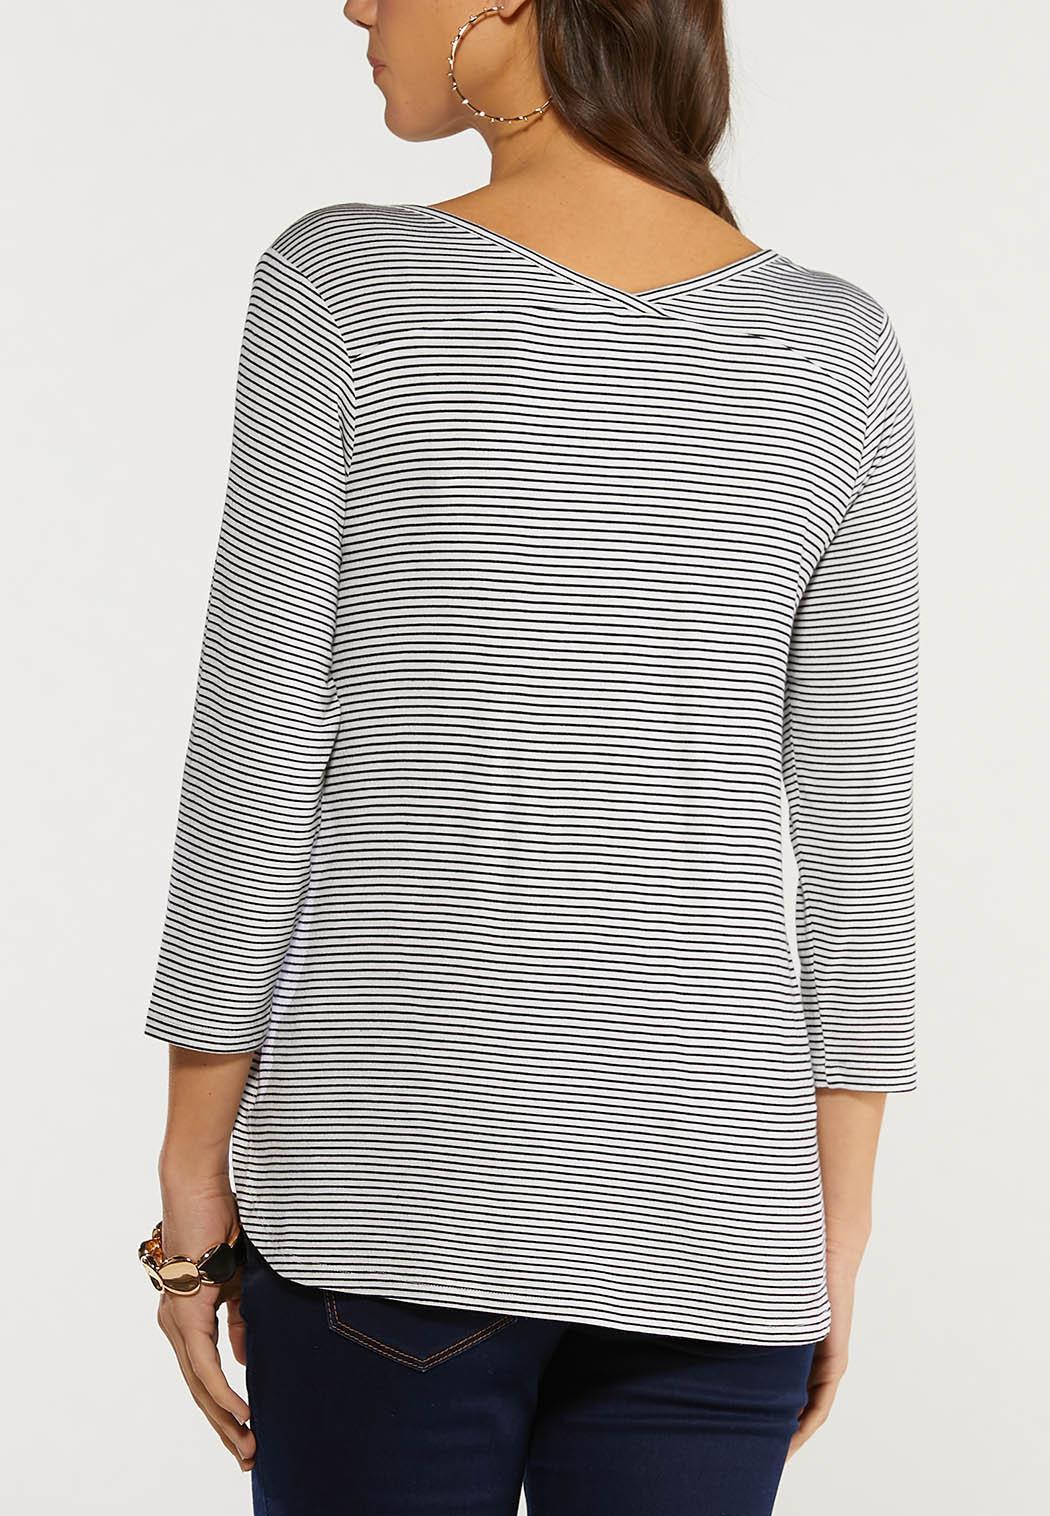 Plus Size Striped Floral Top (Item #44494522)